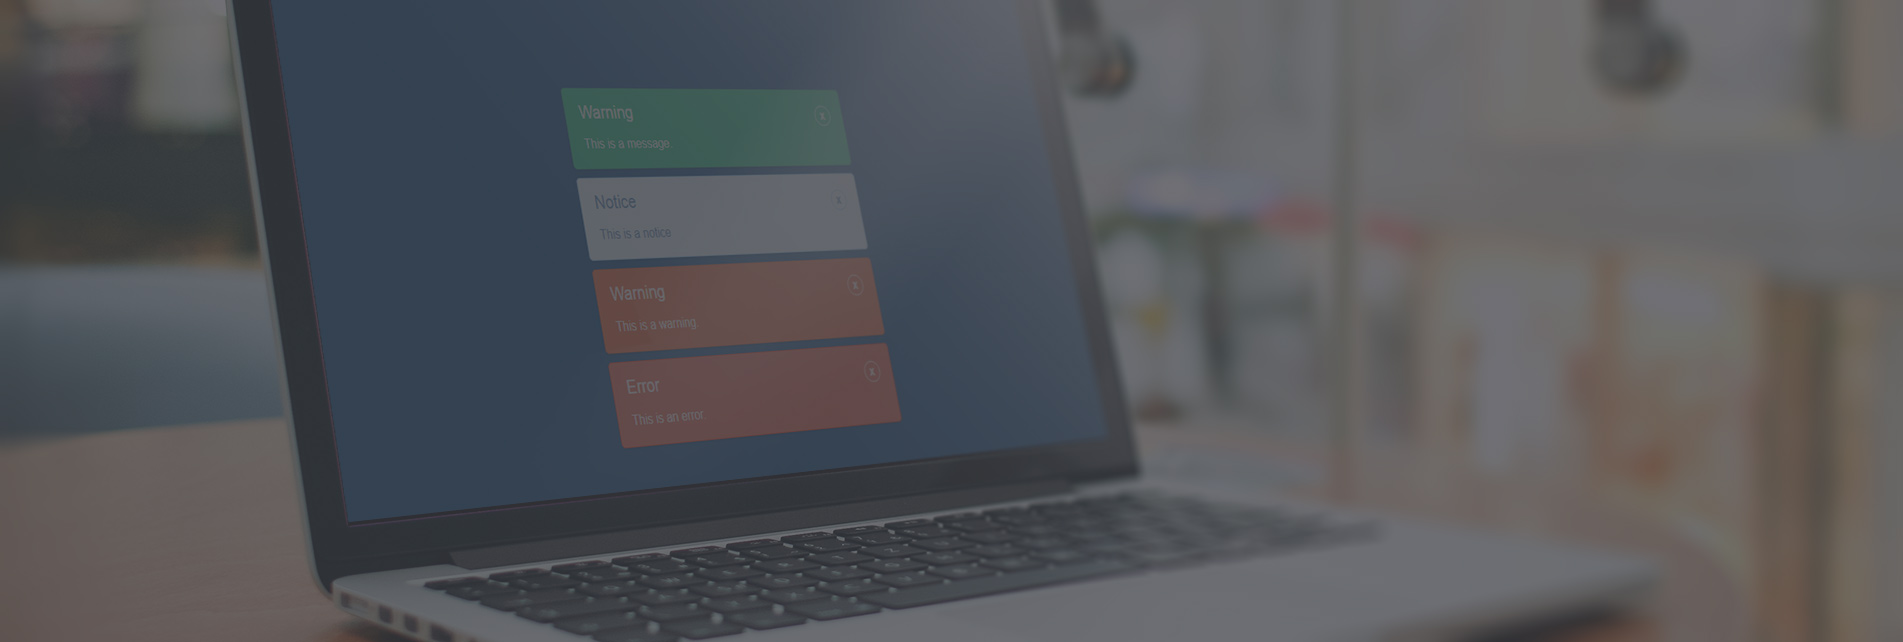 minitek-system-messages تغییر عنوان پنجره مرورگر با PixTitle for joomla - گلچین آنلاین